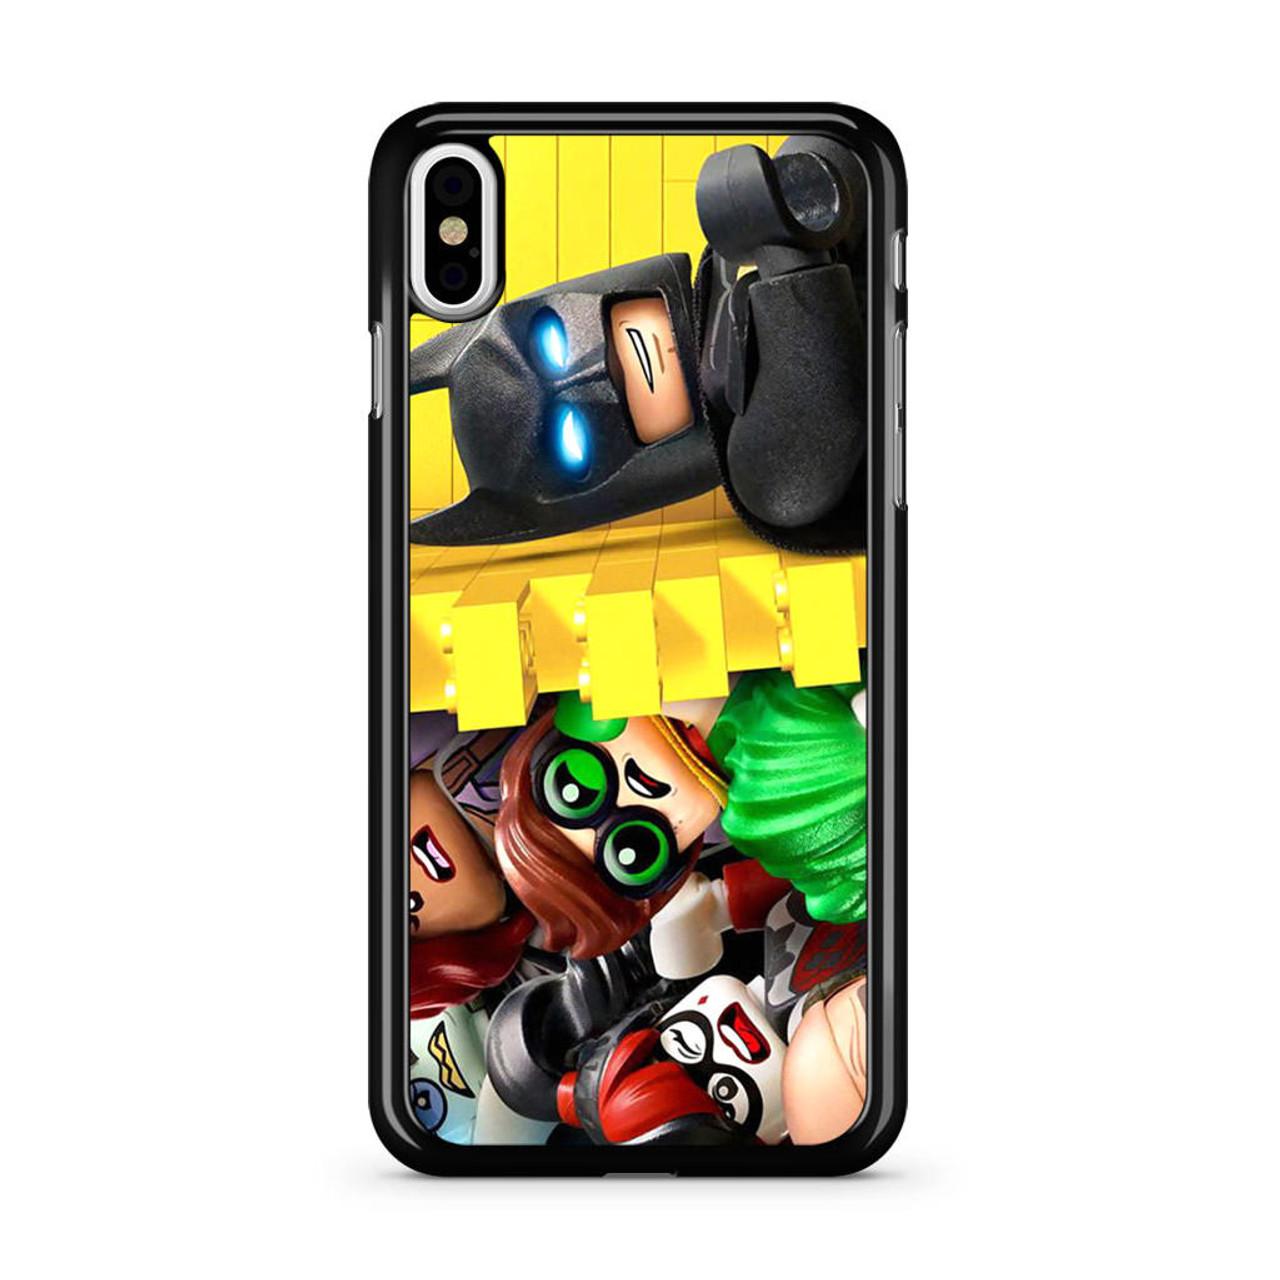 quality design aa4b7 0f601 The Lego Batman Movie iPhone X Case